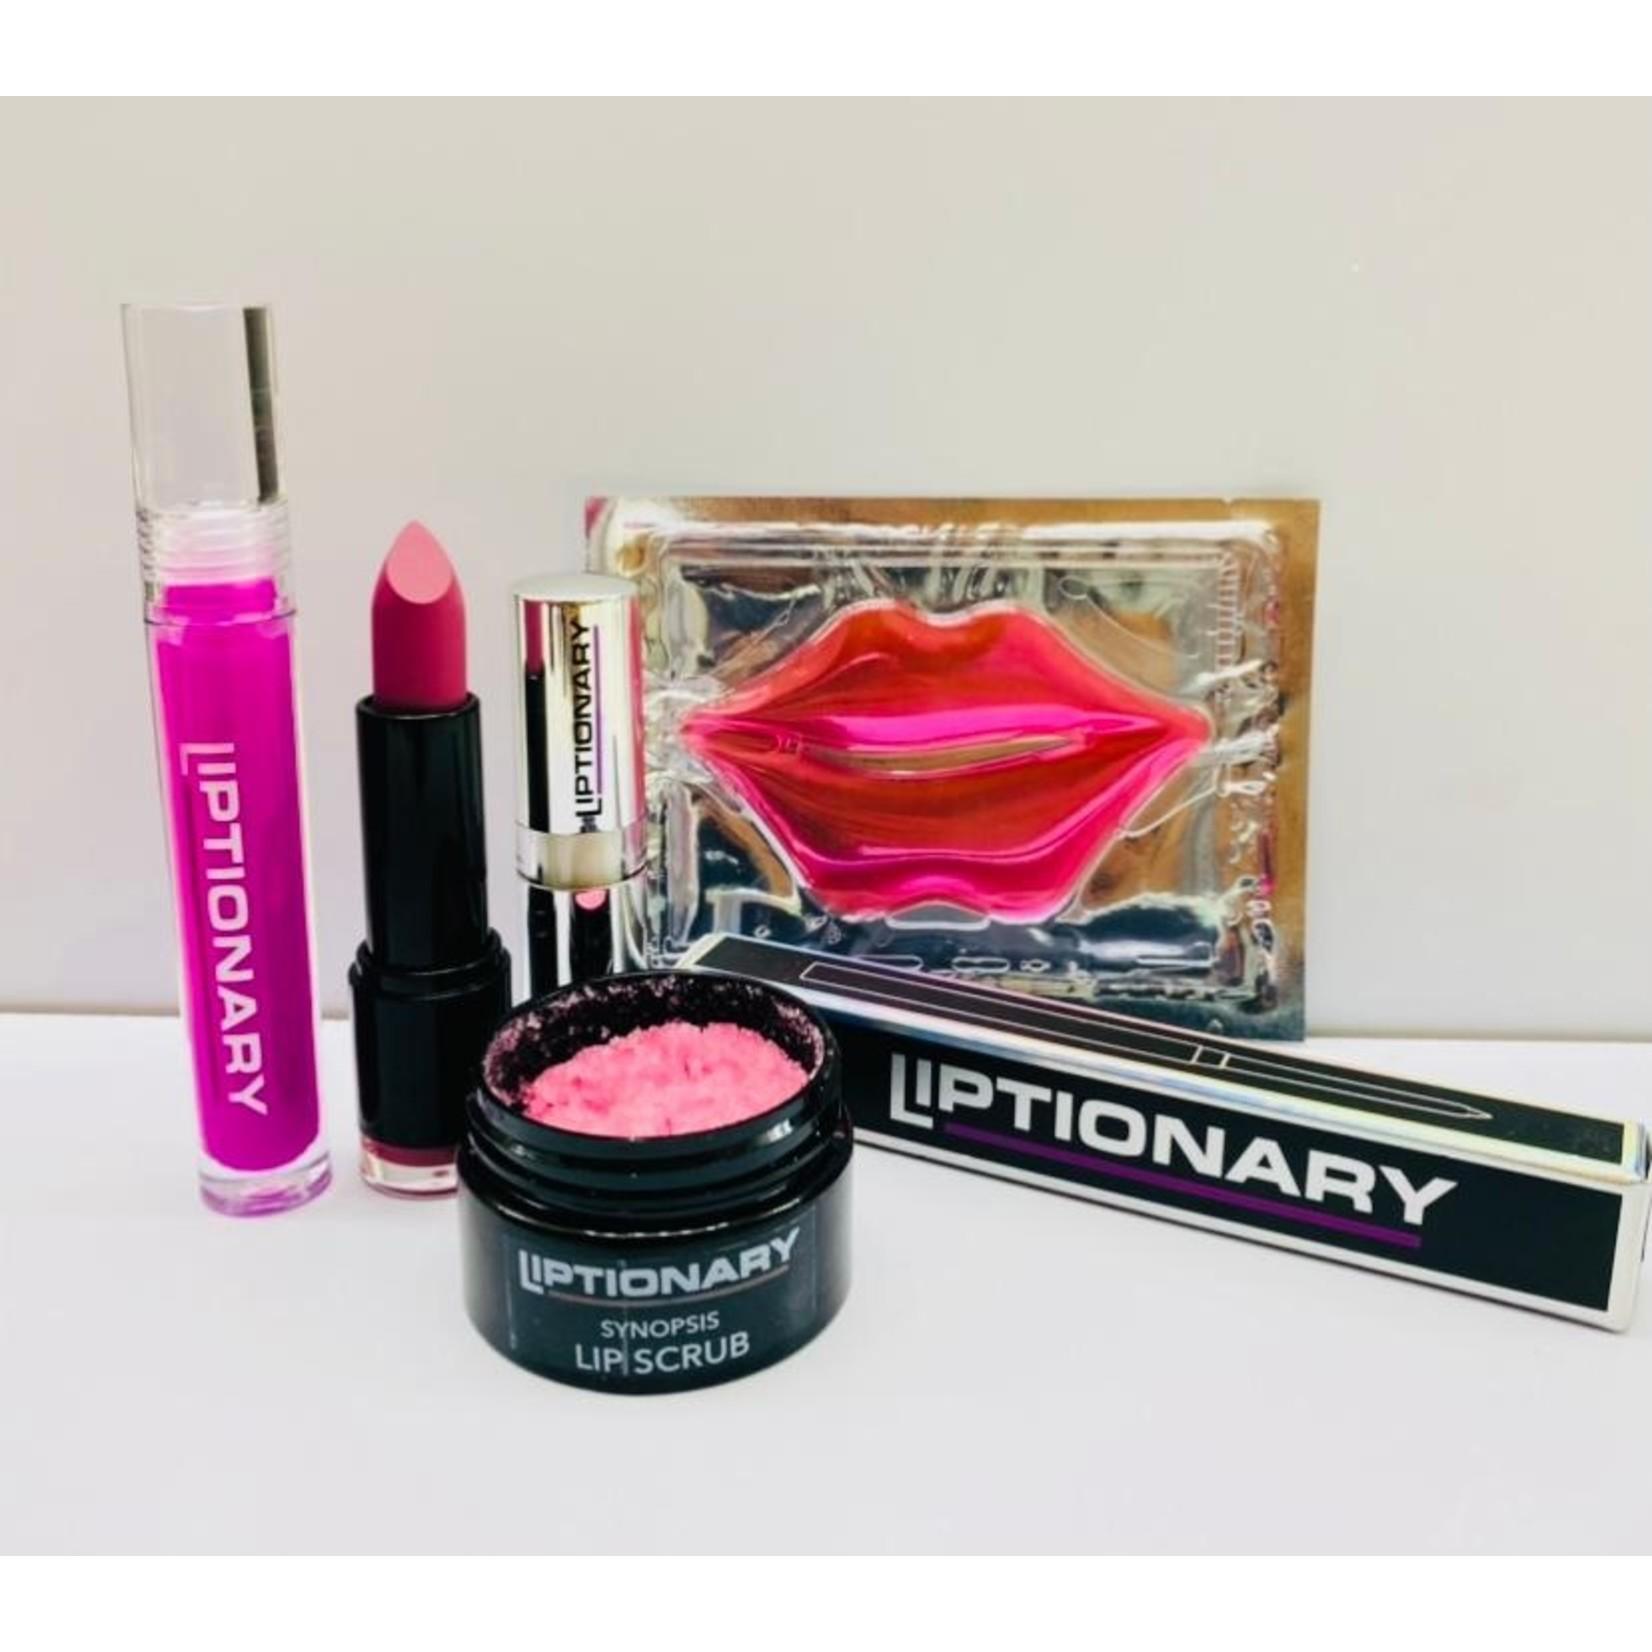 Liptionary Lip Set (Includes Signature Lip Bag)